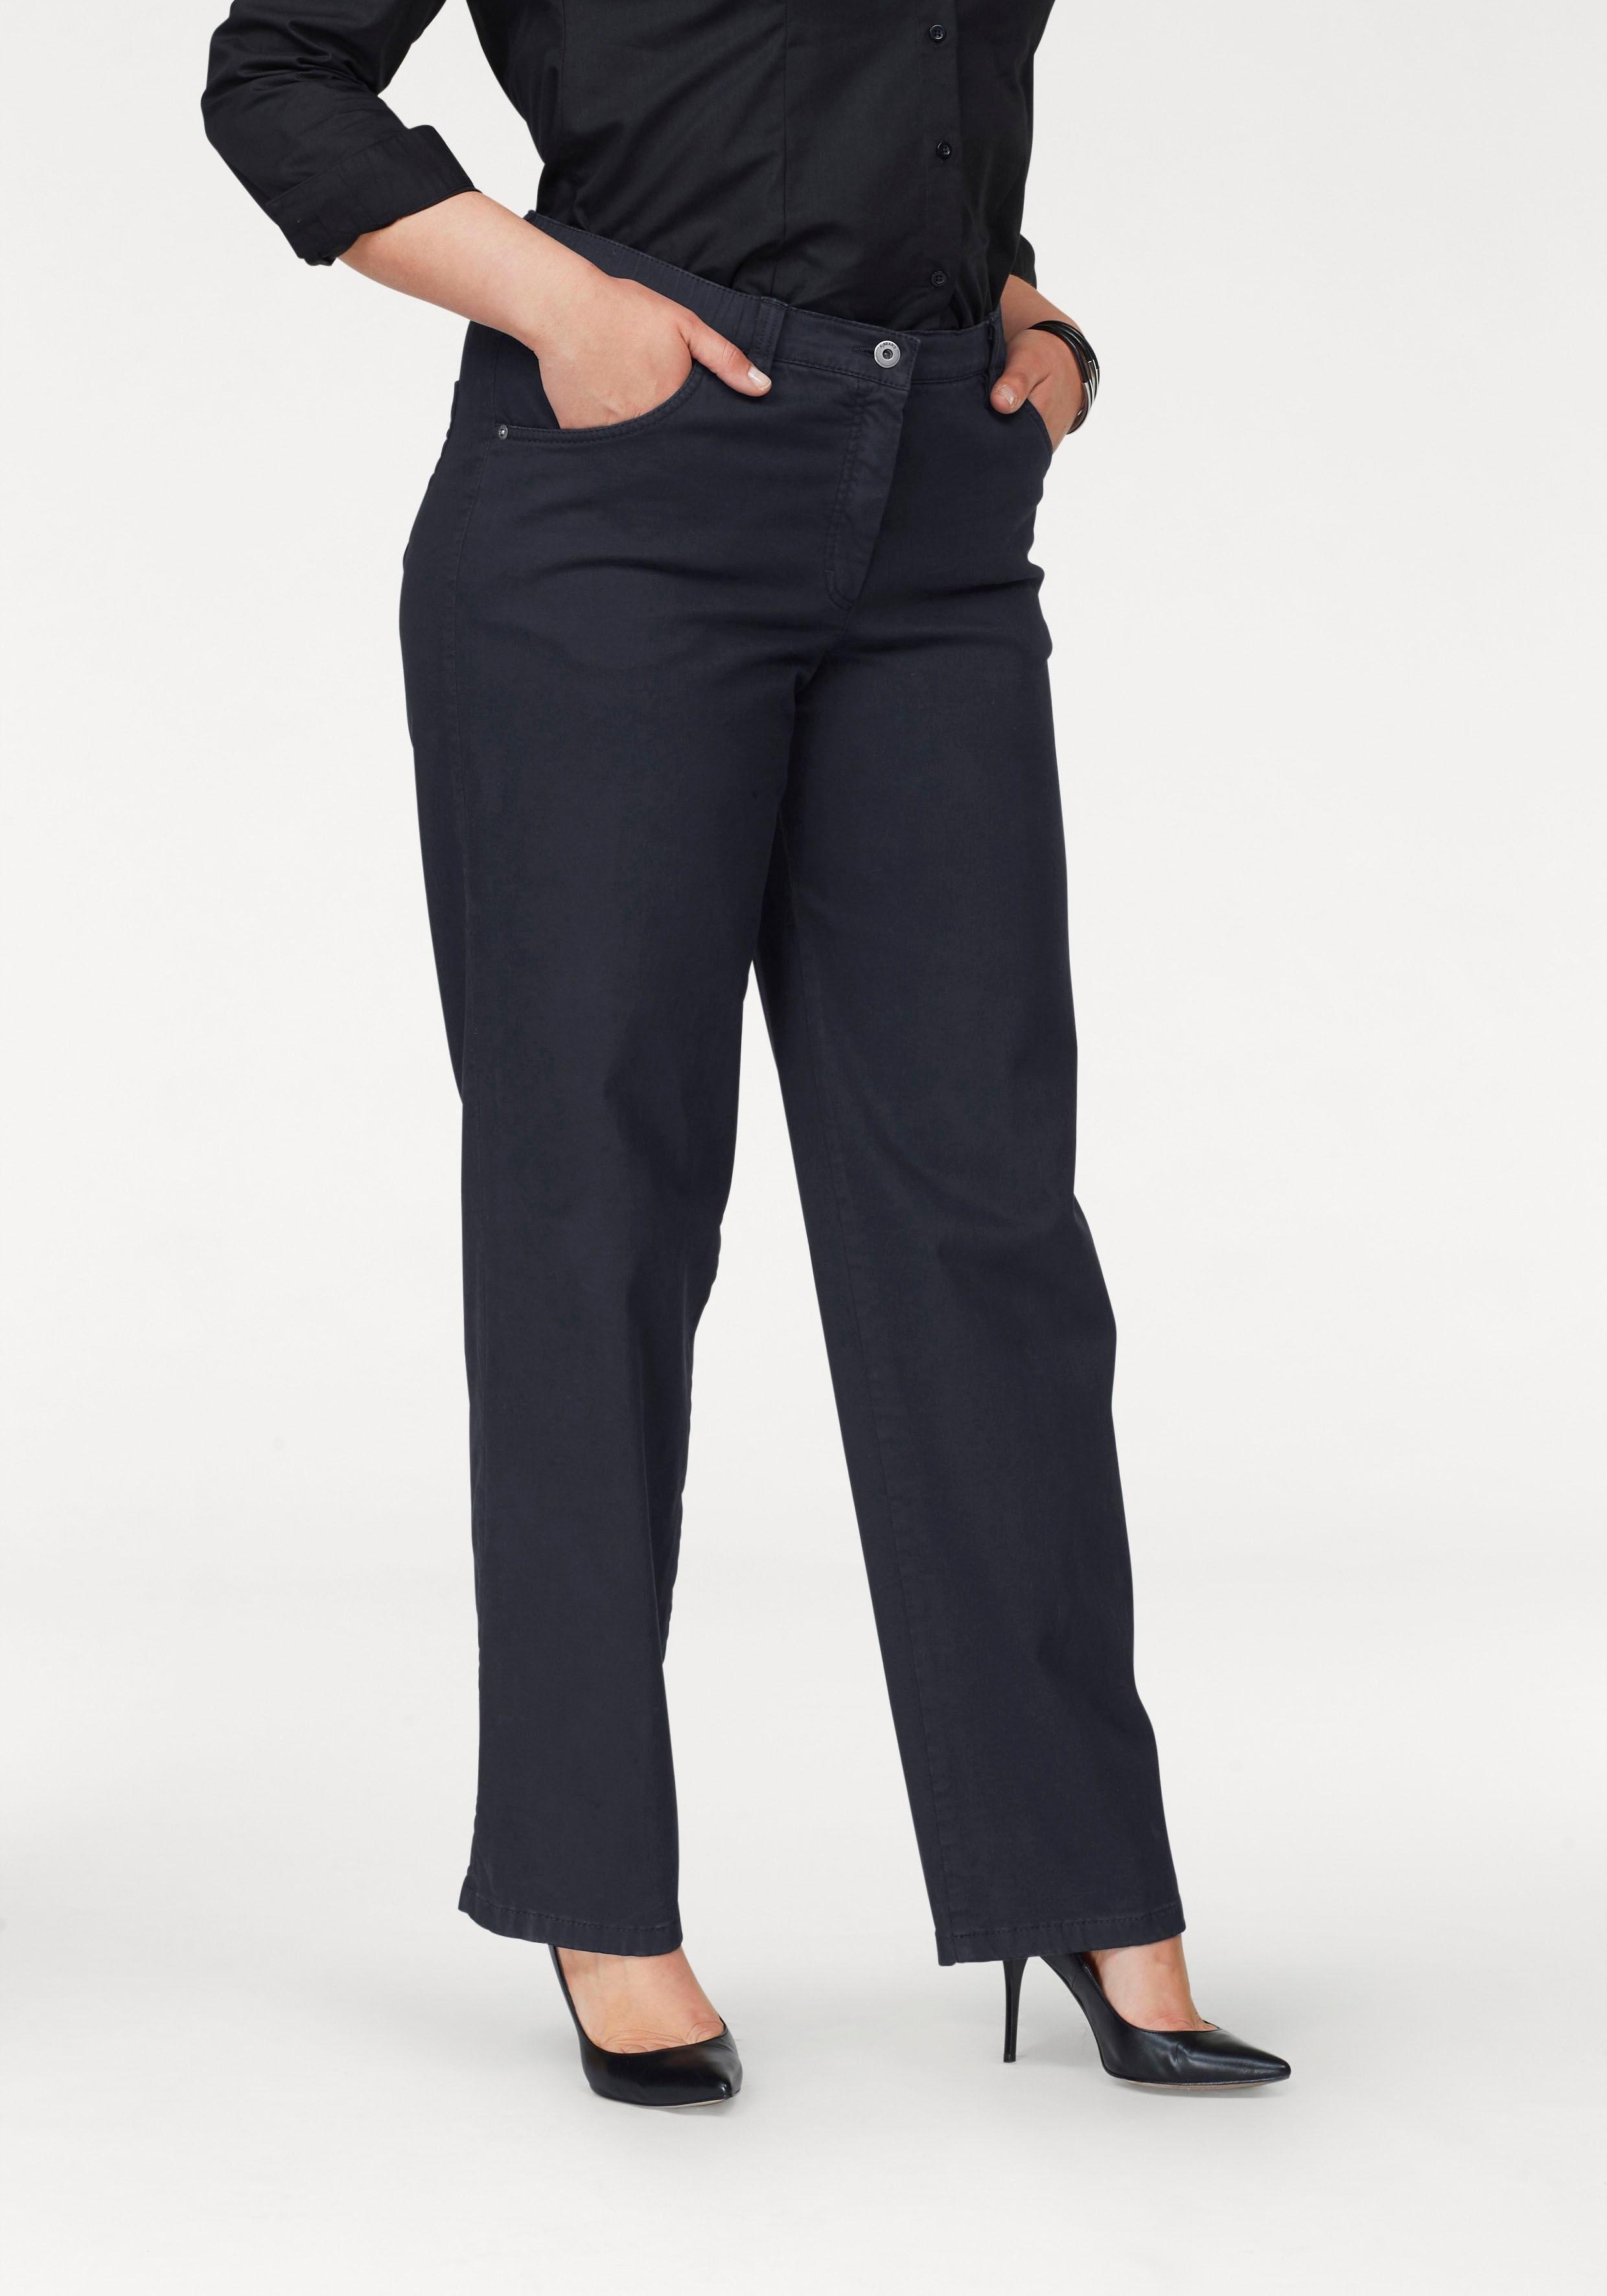 KjBRAND straight jeans »Babsie« voordelig en veilig online kopen